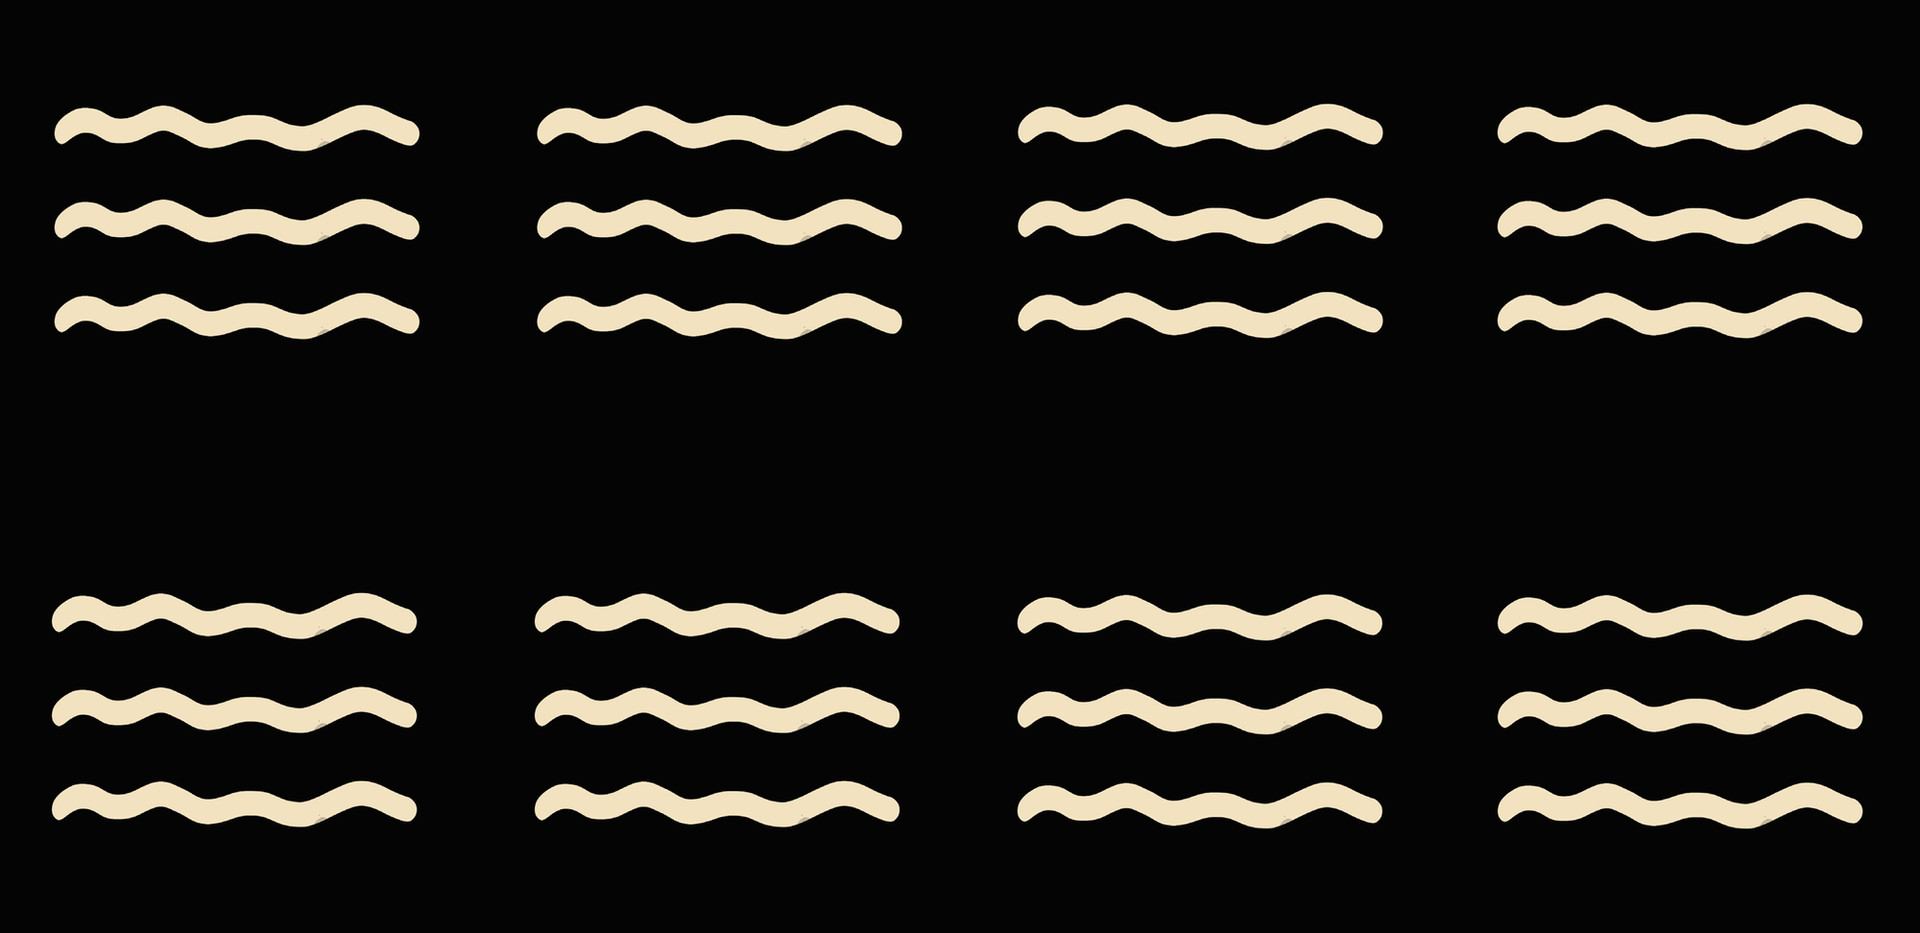 Masai Mara . Ivory Waves . Onyx